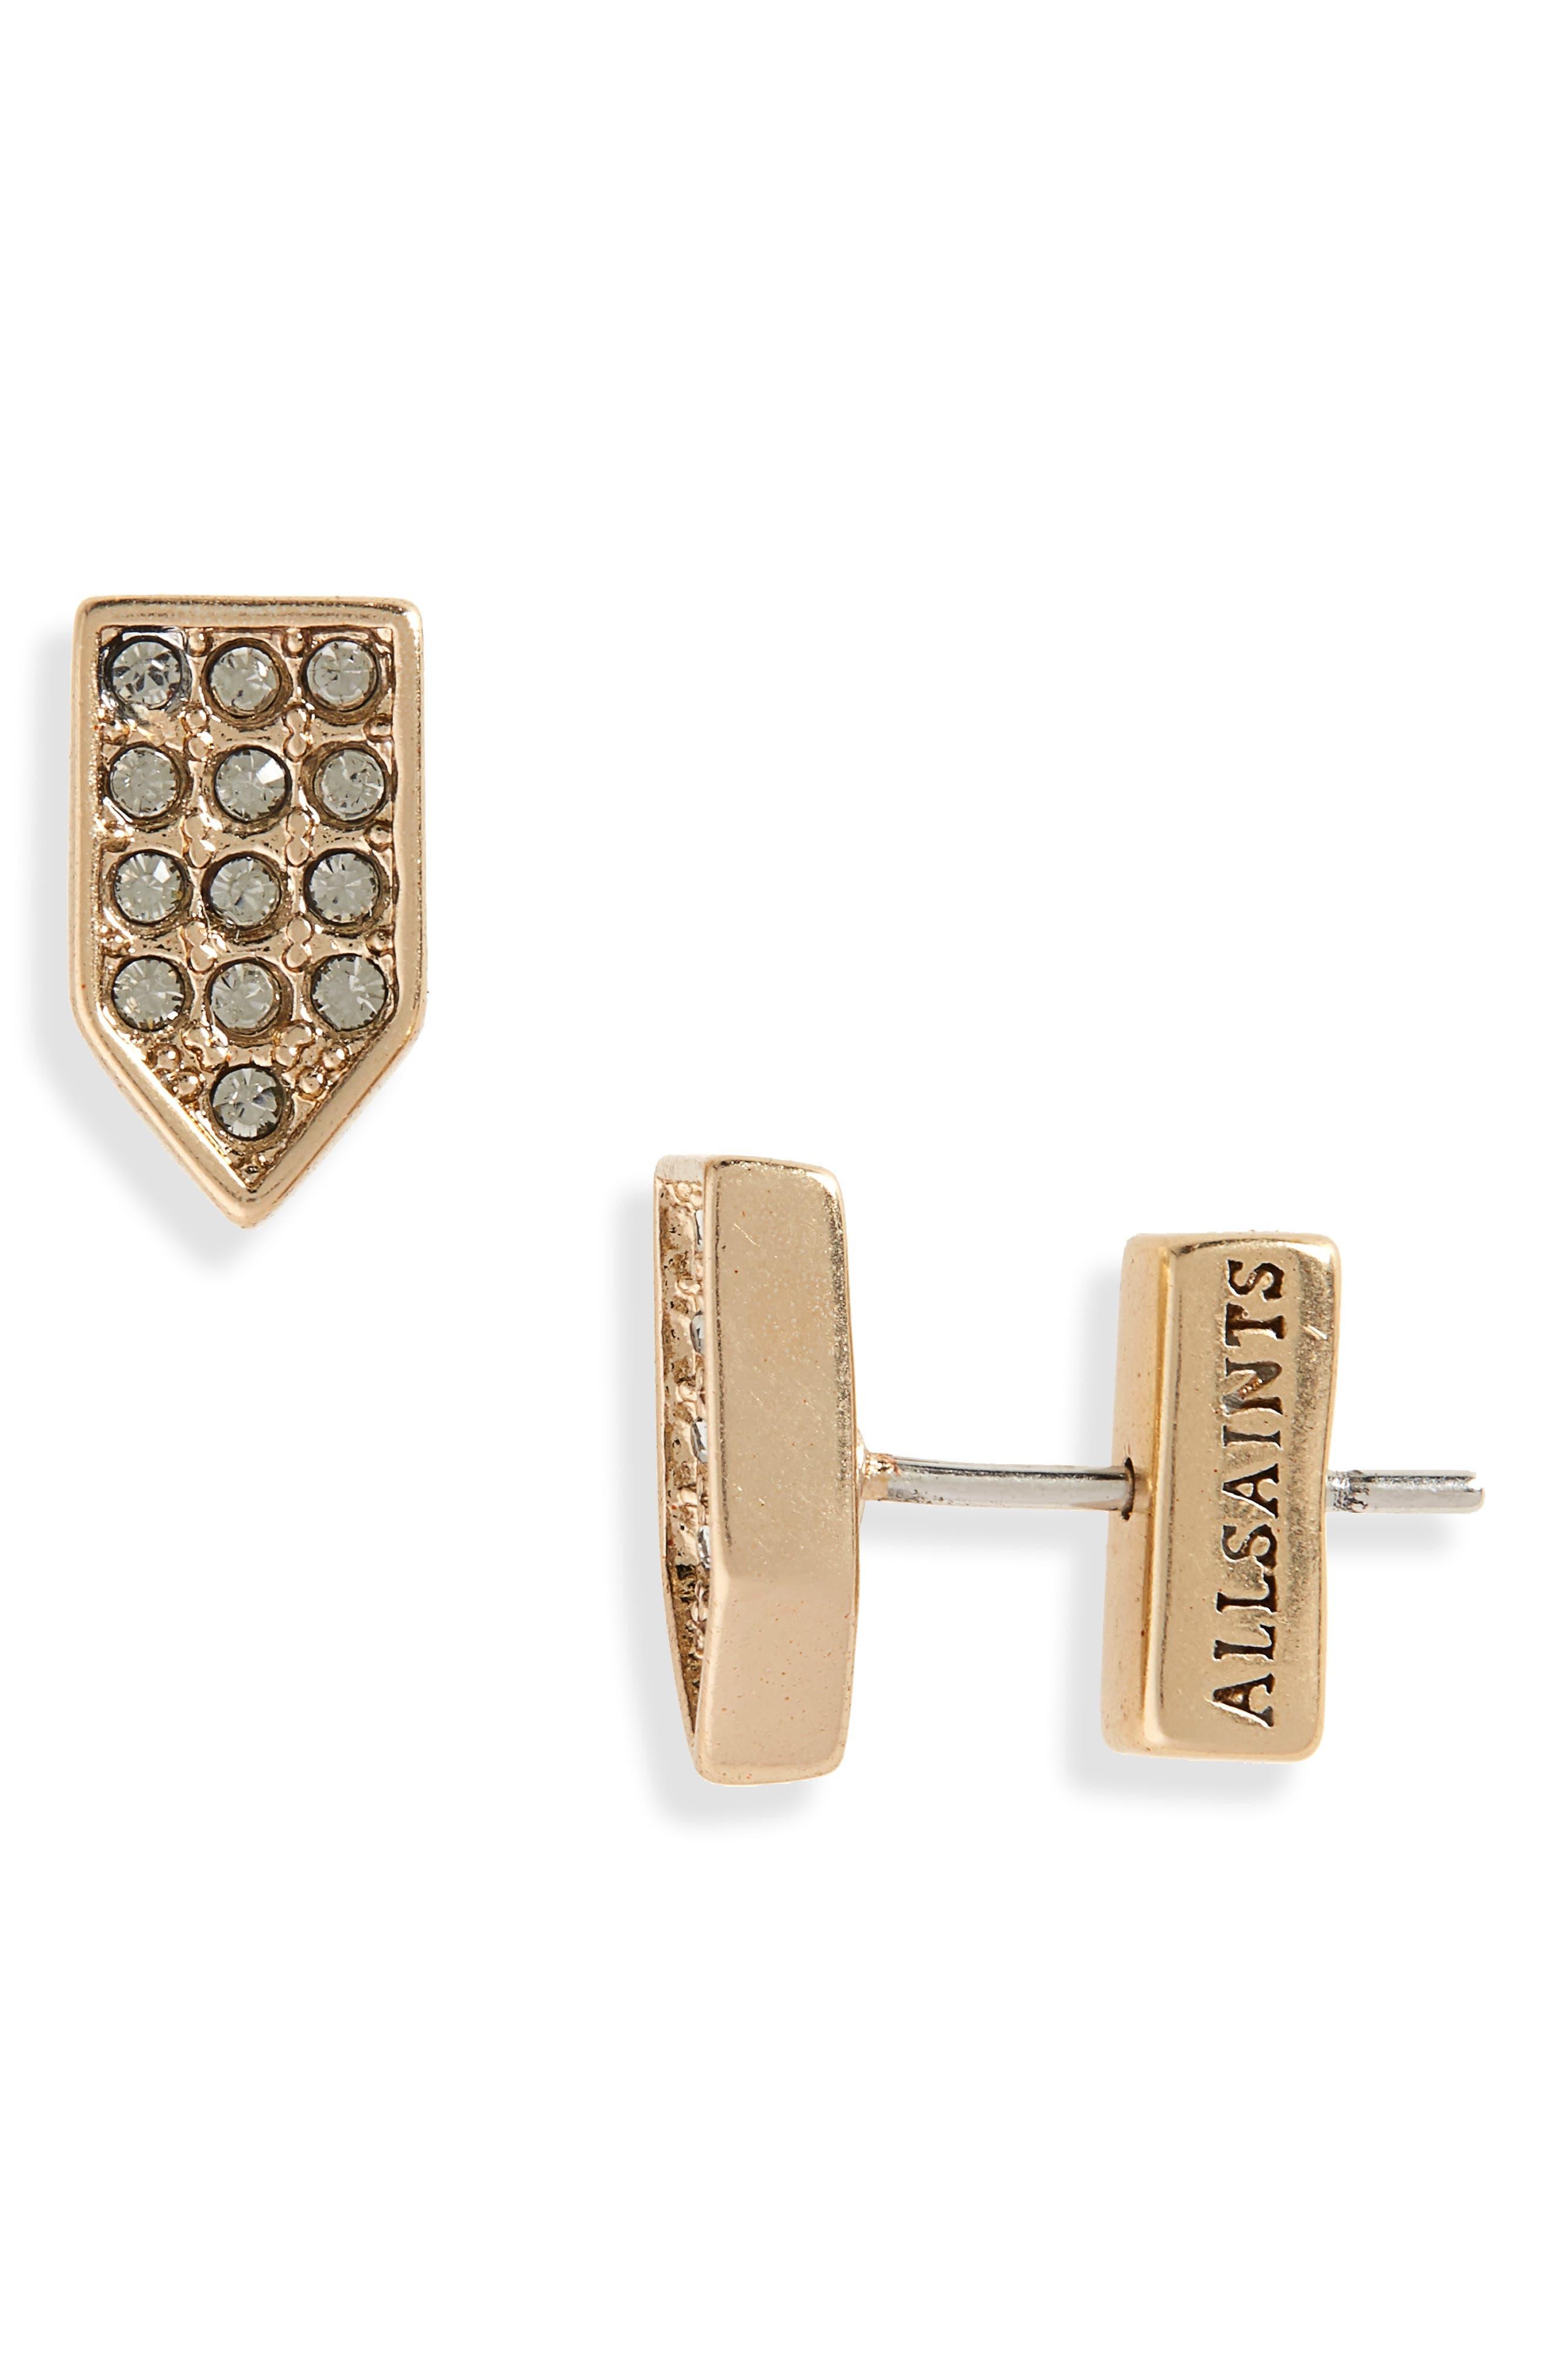 Image of ALLSAINTS Pavé Geometric Stud Earrings